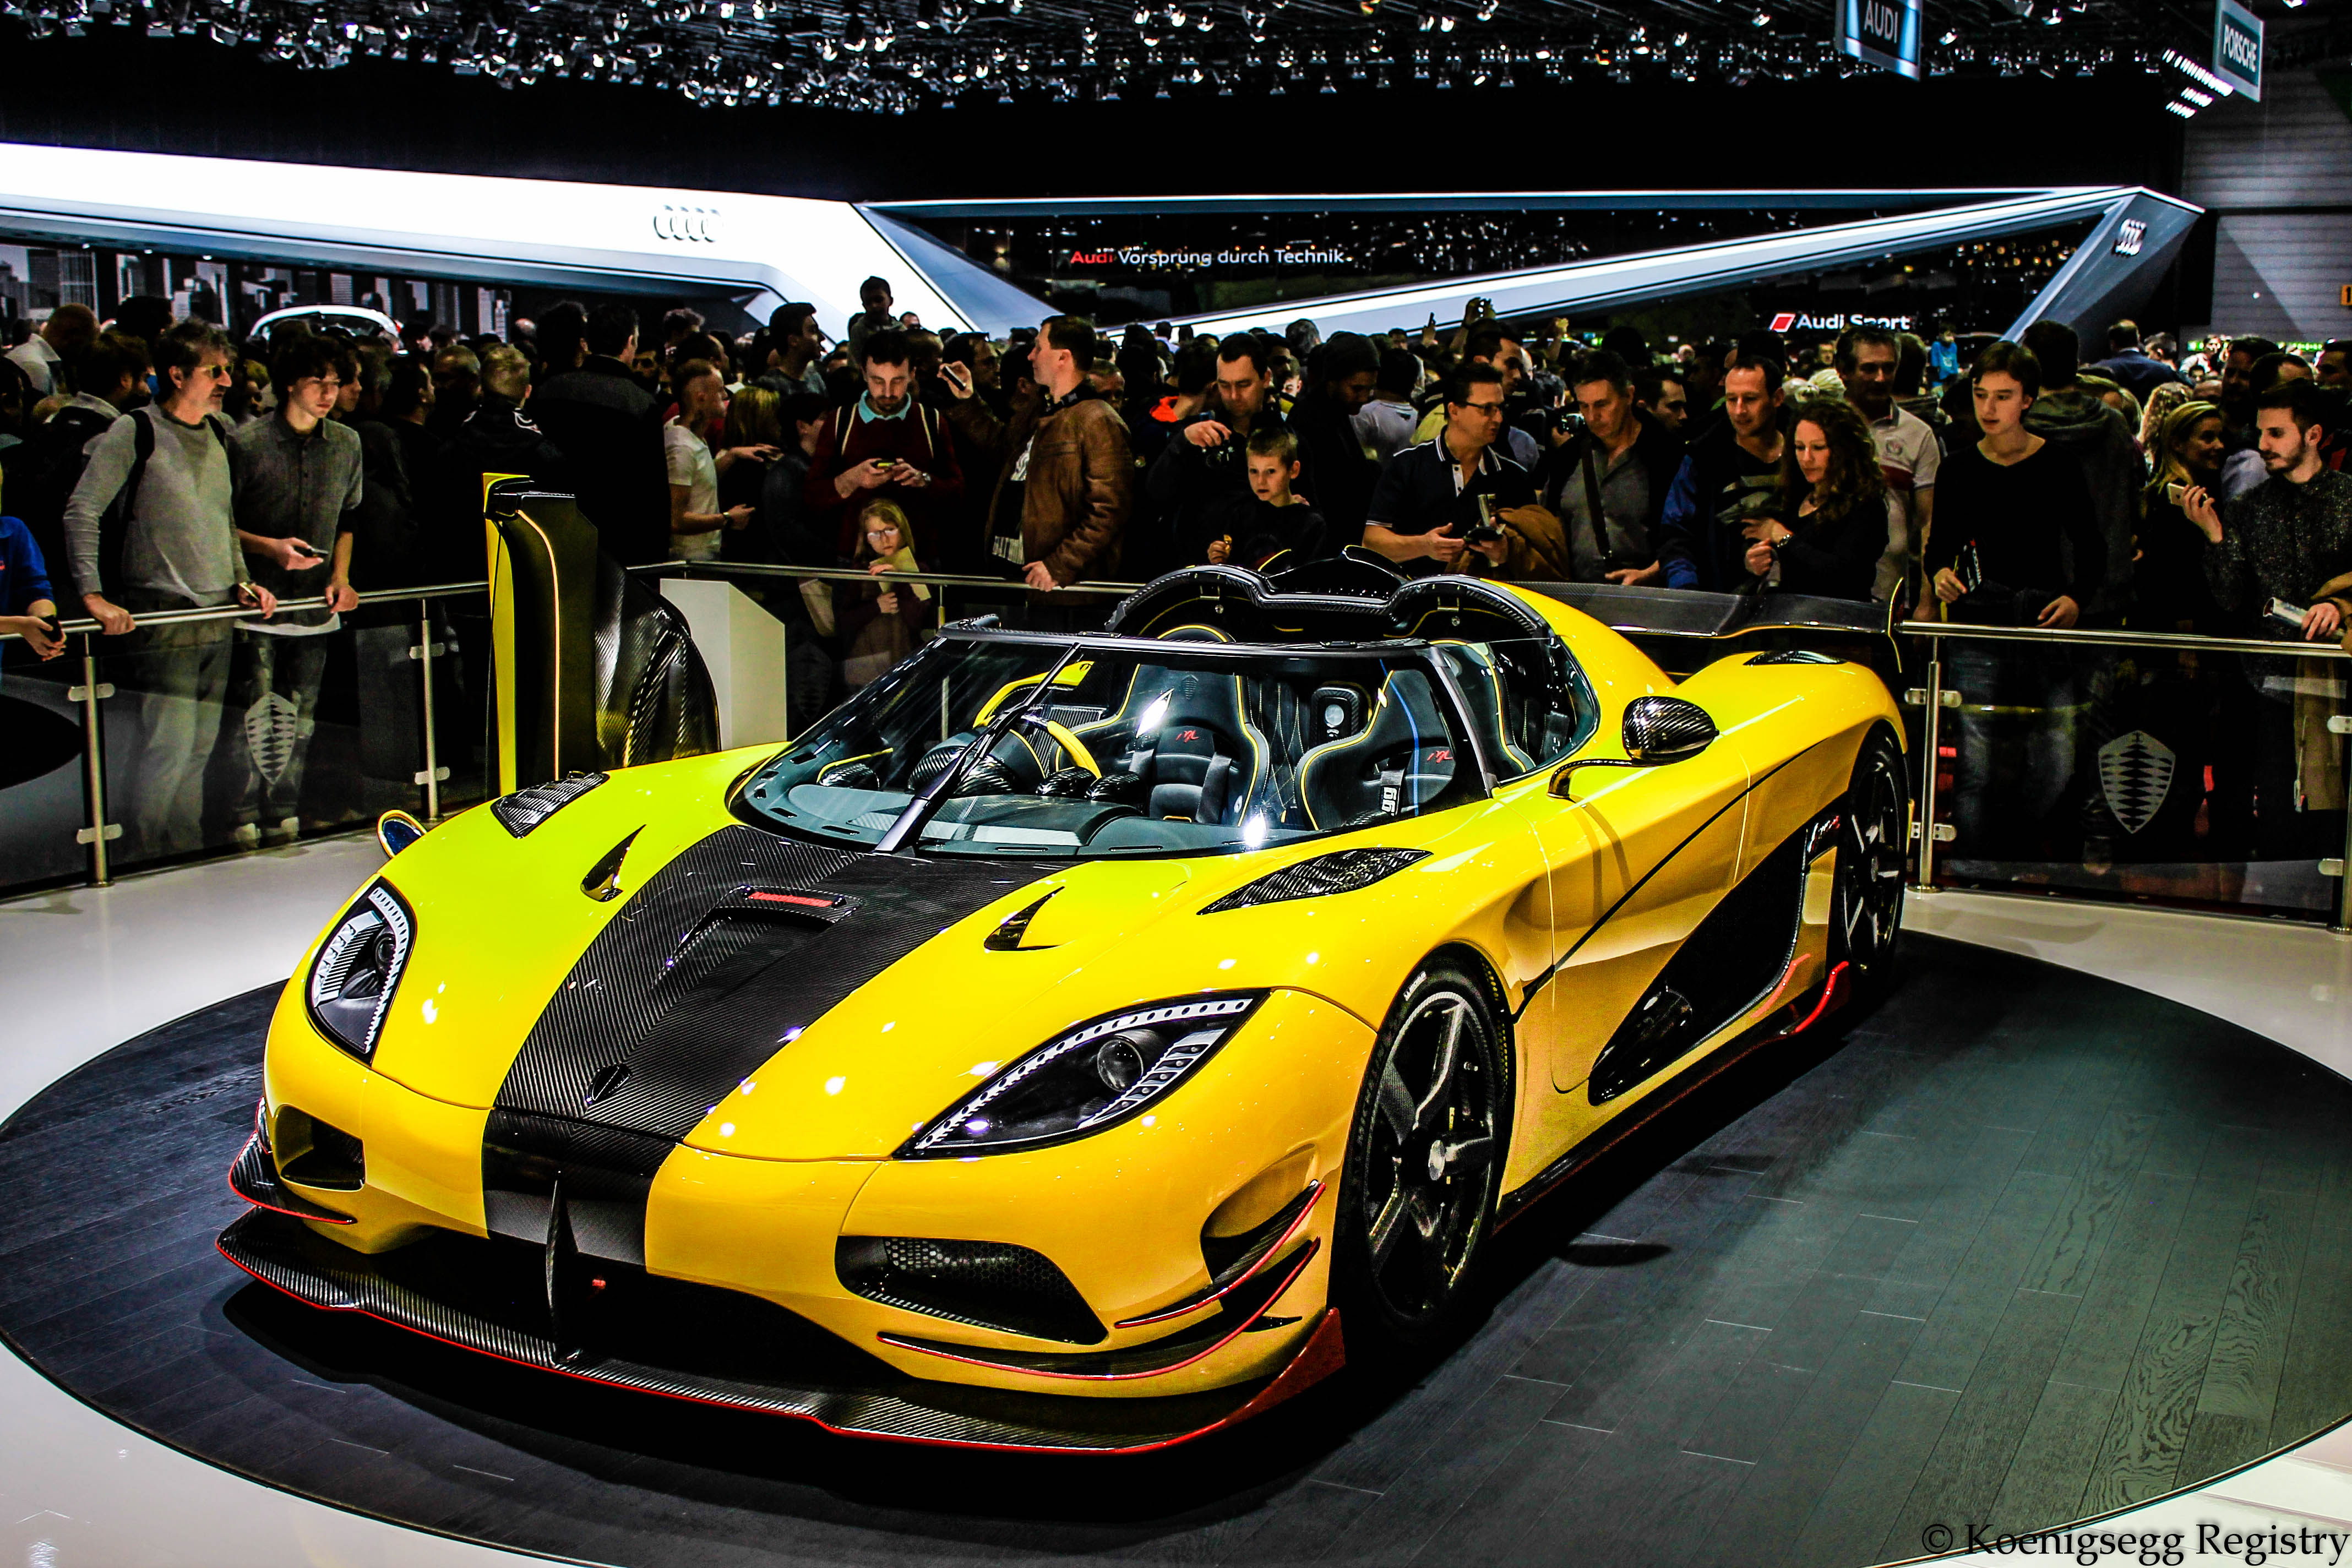 "#118 Agera RS ""ML"" - Loke Yellow w/red accents / black int. RHD-img_3656.jpg"